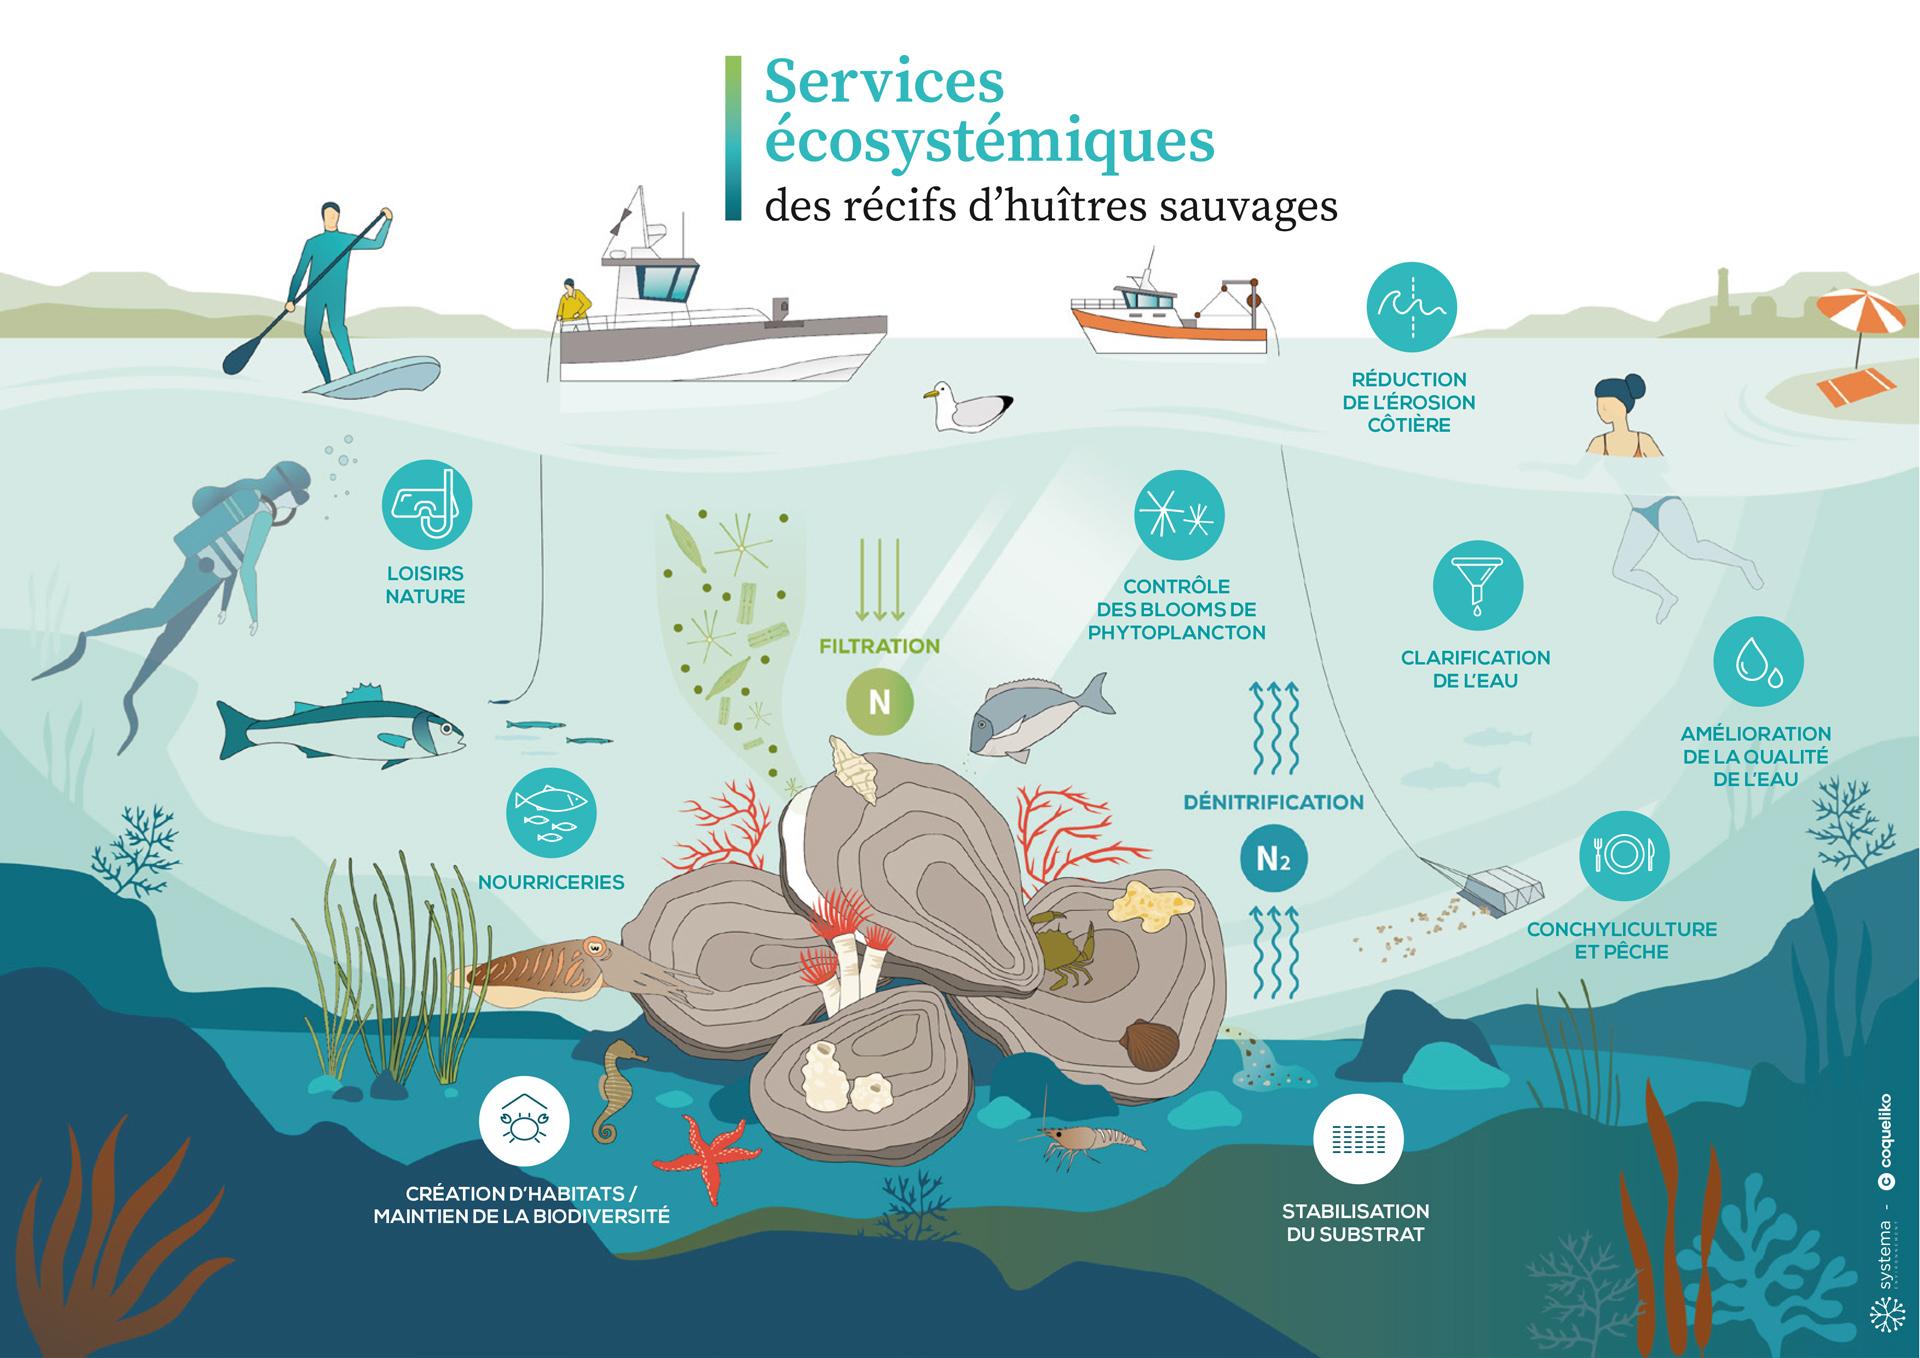 Illustration-nature-services-ecosystemique-bretagne-Agence-Coqueliko-Lannion